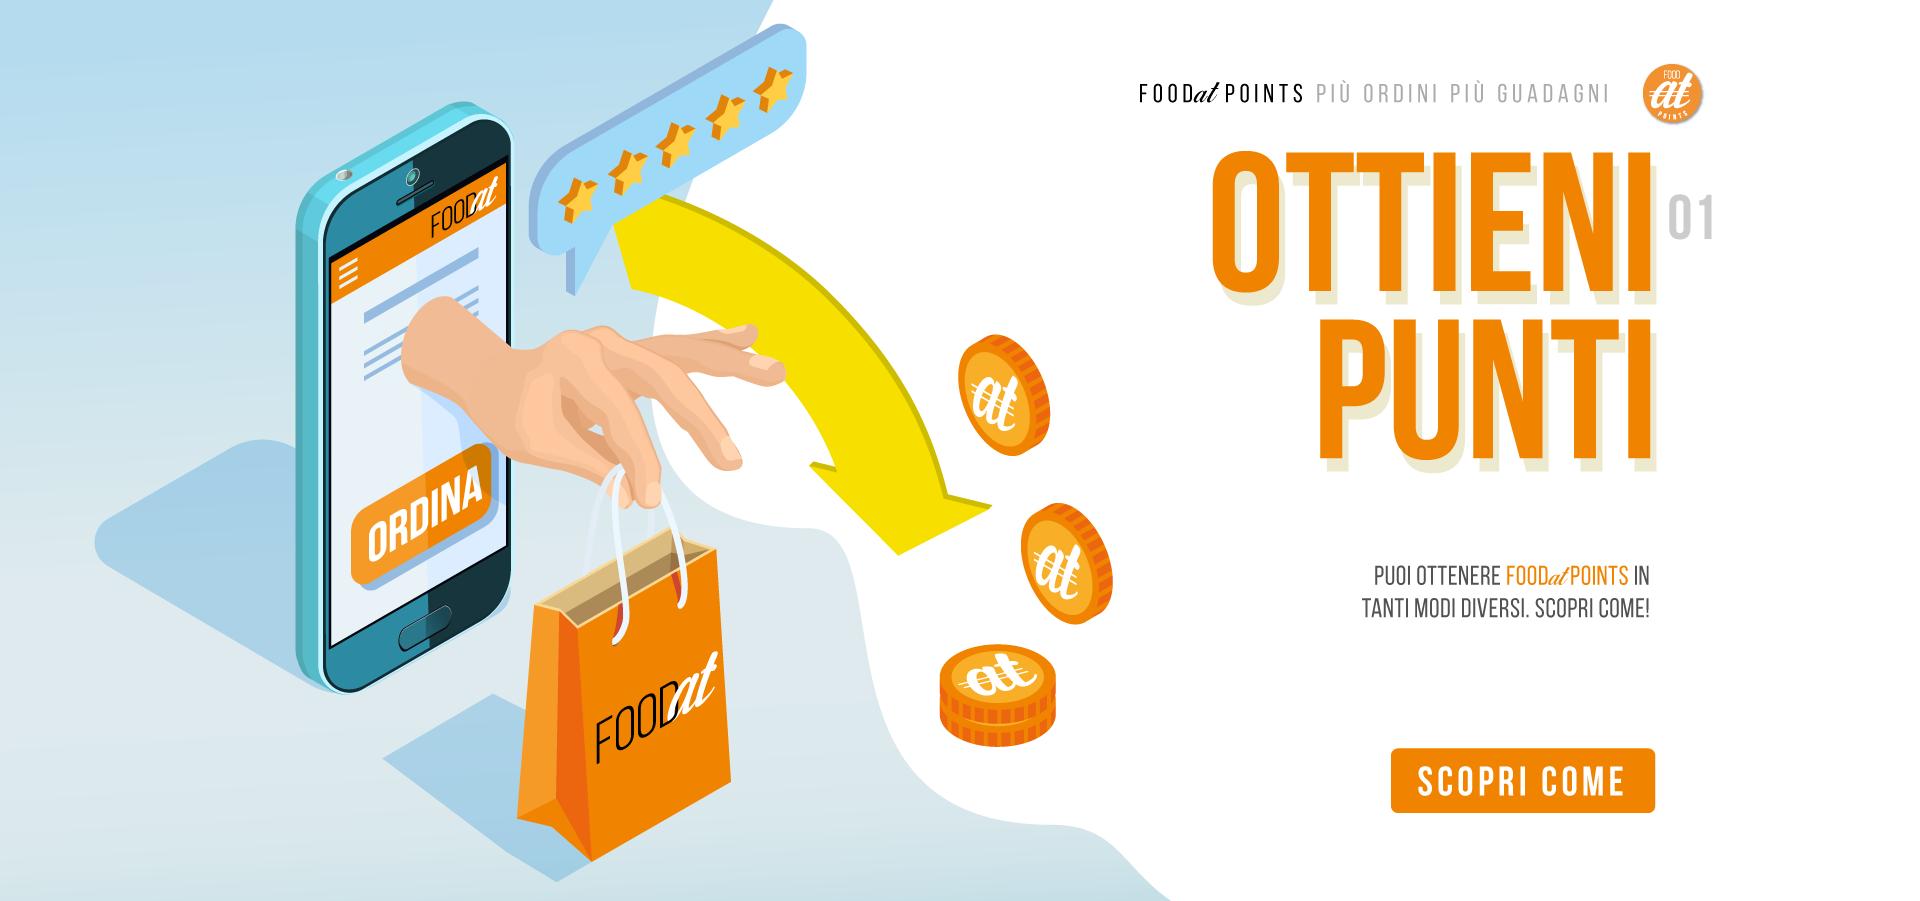 01 ORDINA – foodat points